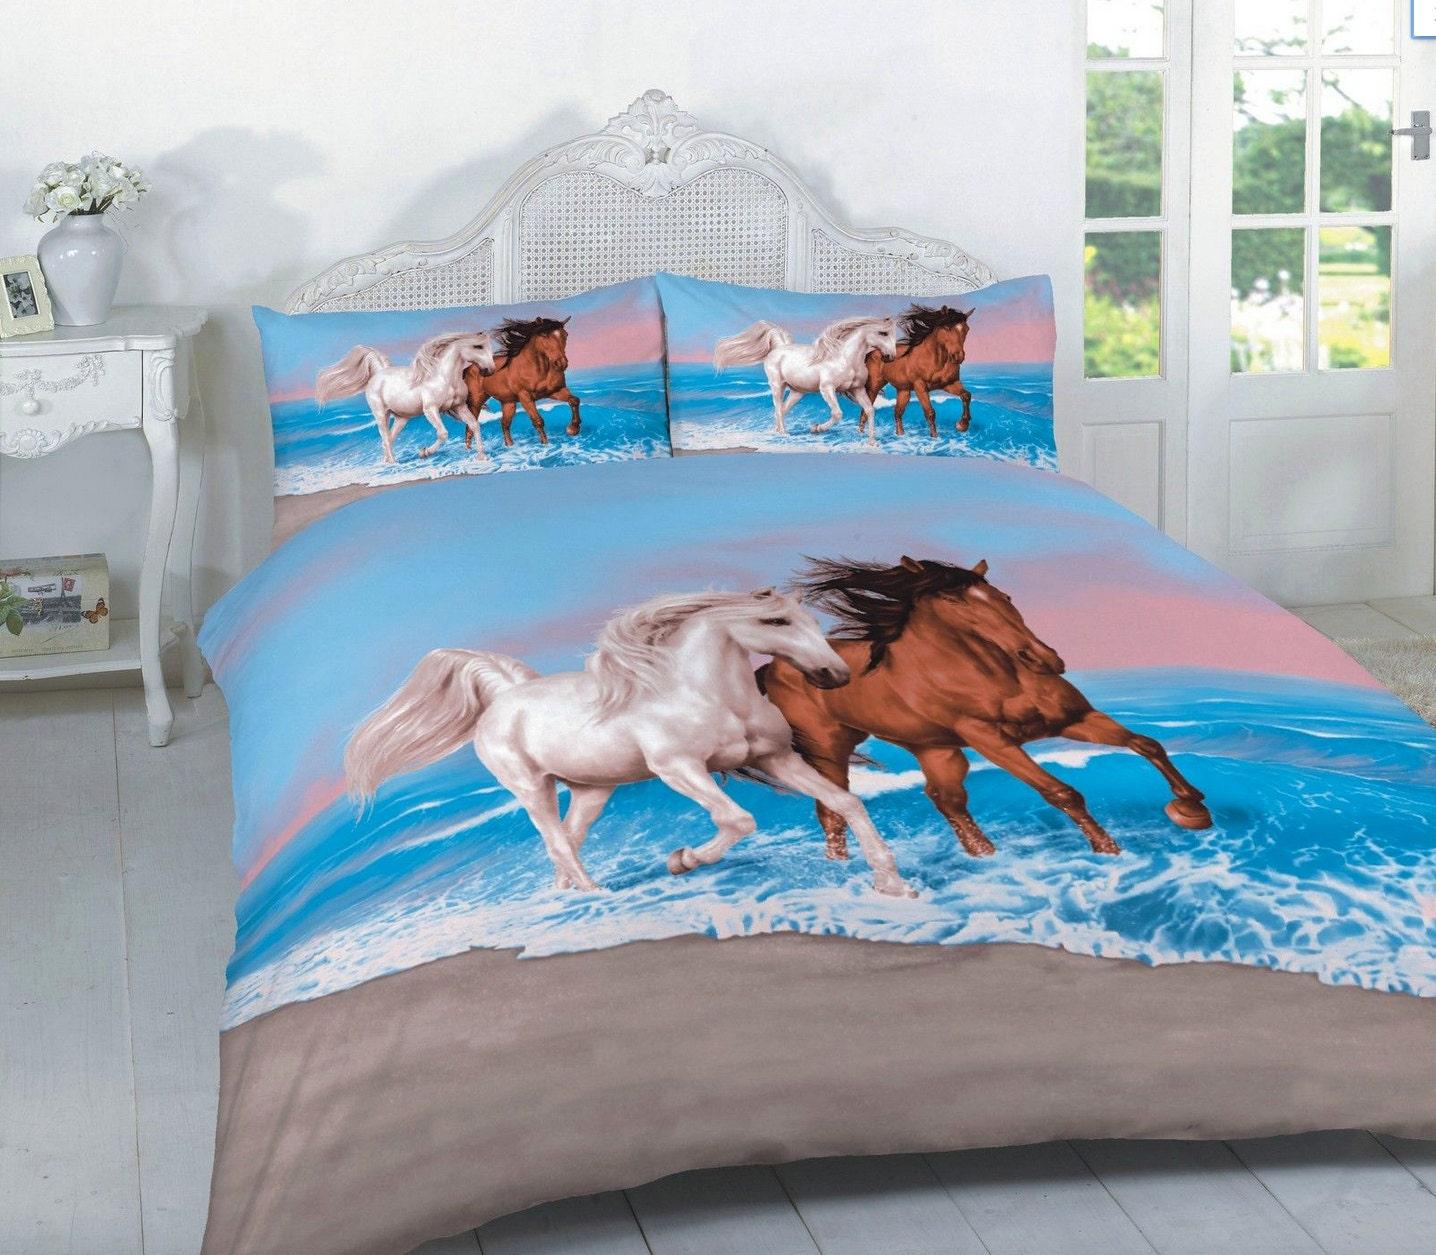 Horses Bedding Printed 3D HD Quilt Duvet Bedding Cover Bedding